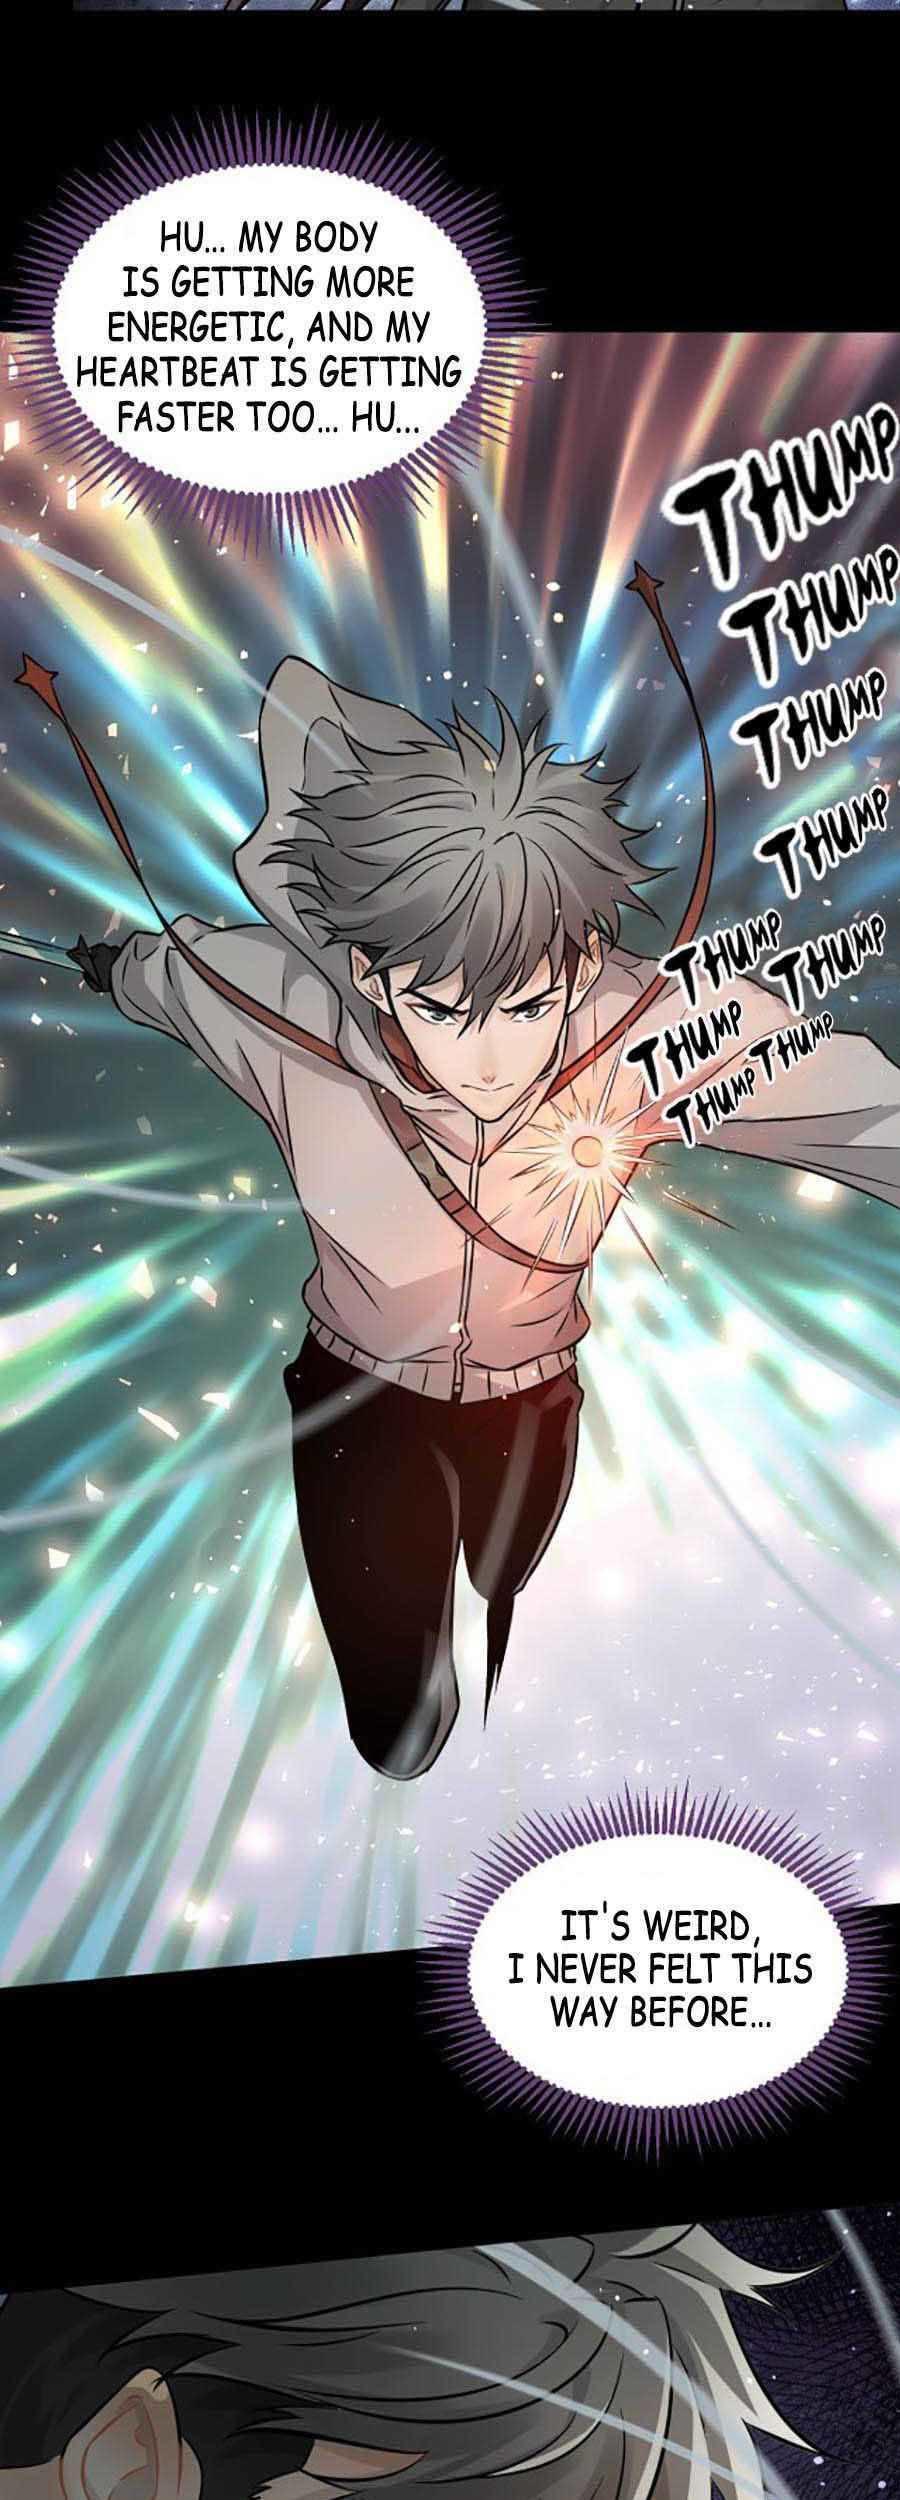 Take The Crown, I Want To Be A King Chapter 23 page 20 - Mangakakalots.com